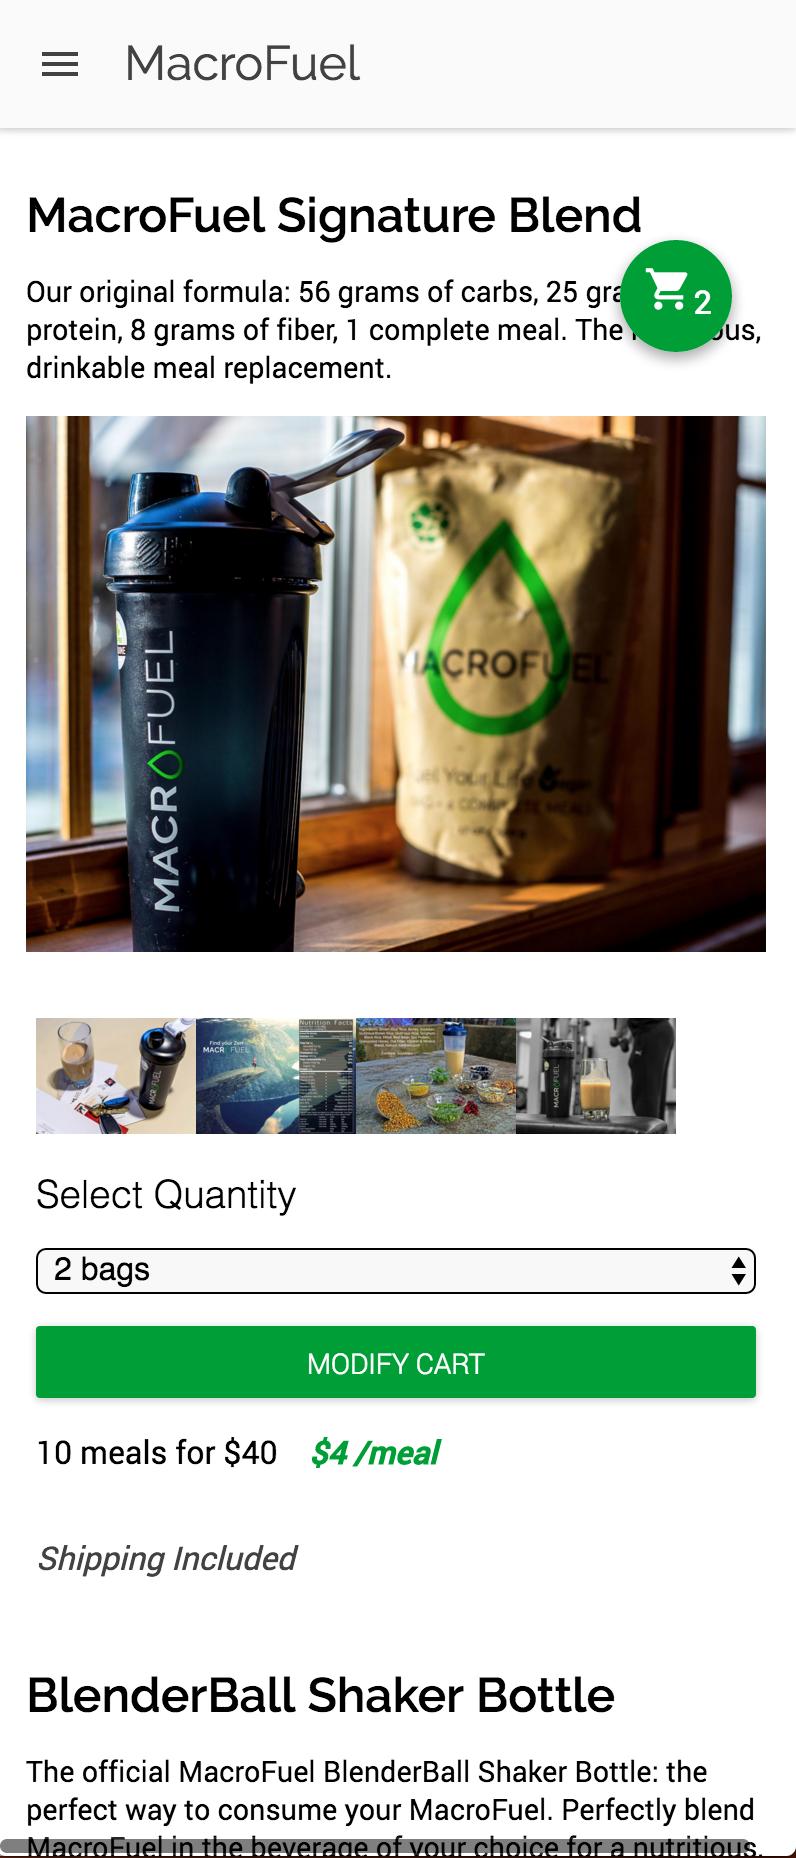 MacroFuel Food Online Store v2 Mobile